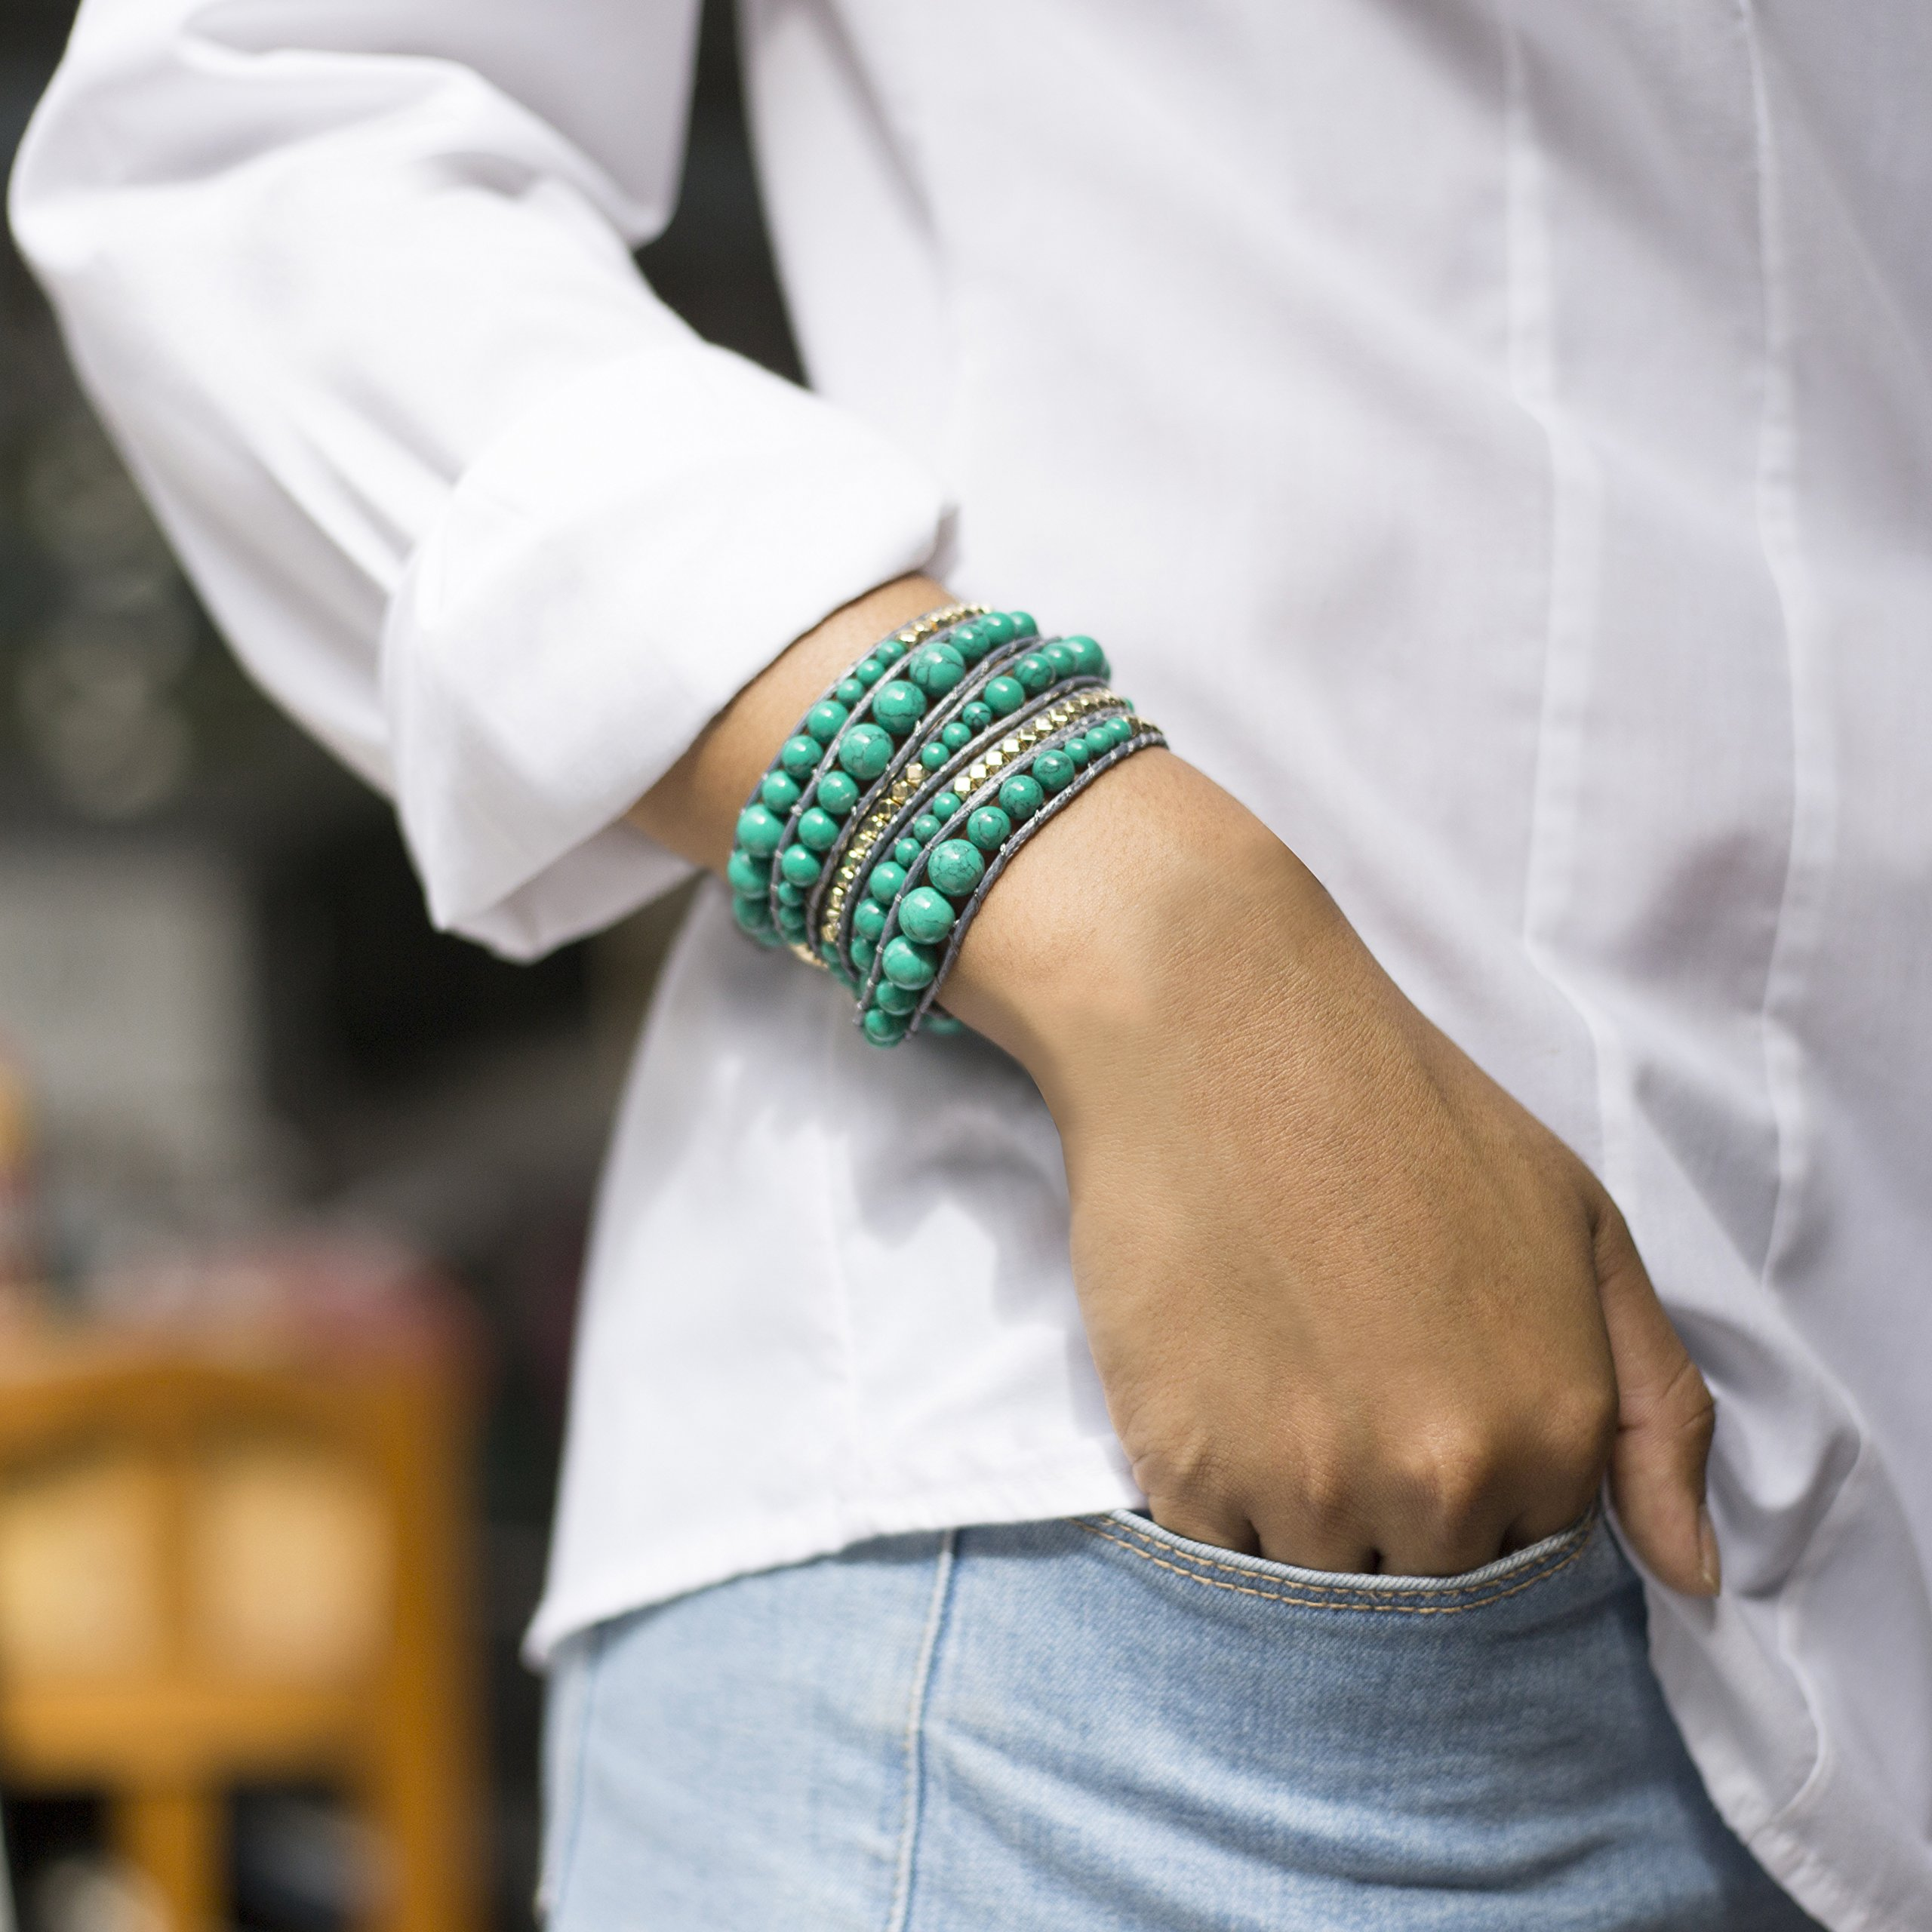 Genuine Stones 5 Wrap Bracelet - Bangle Cuff Rope With Beads - Unisex - Free Size Adjustable (Turquoise) by Sun Life Style (Image #3)